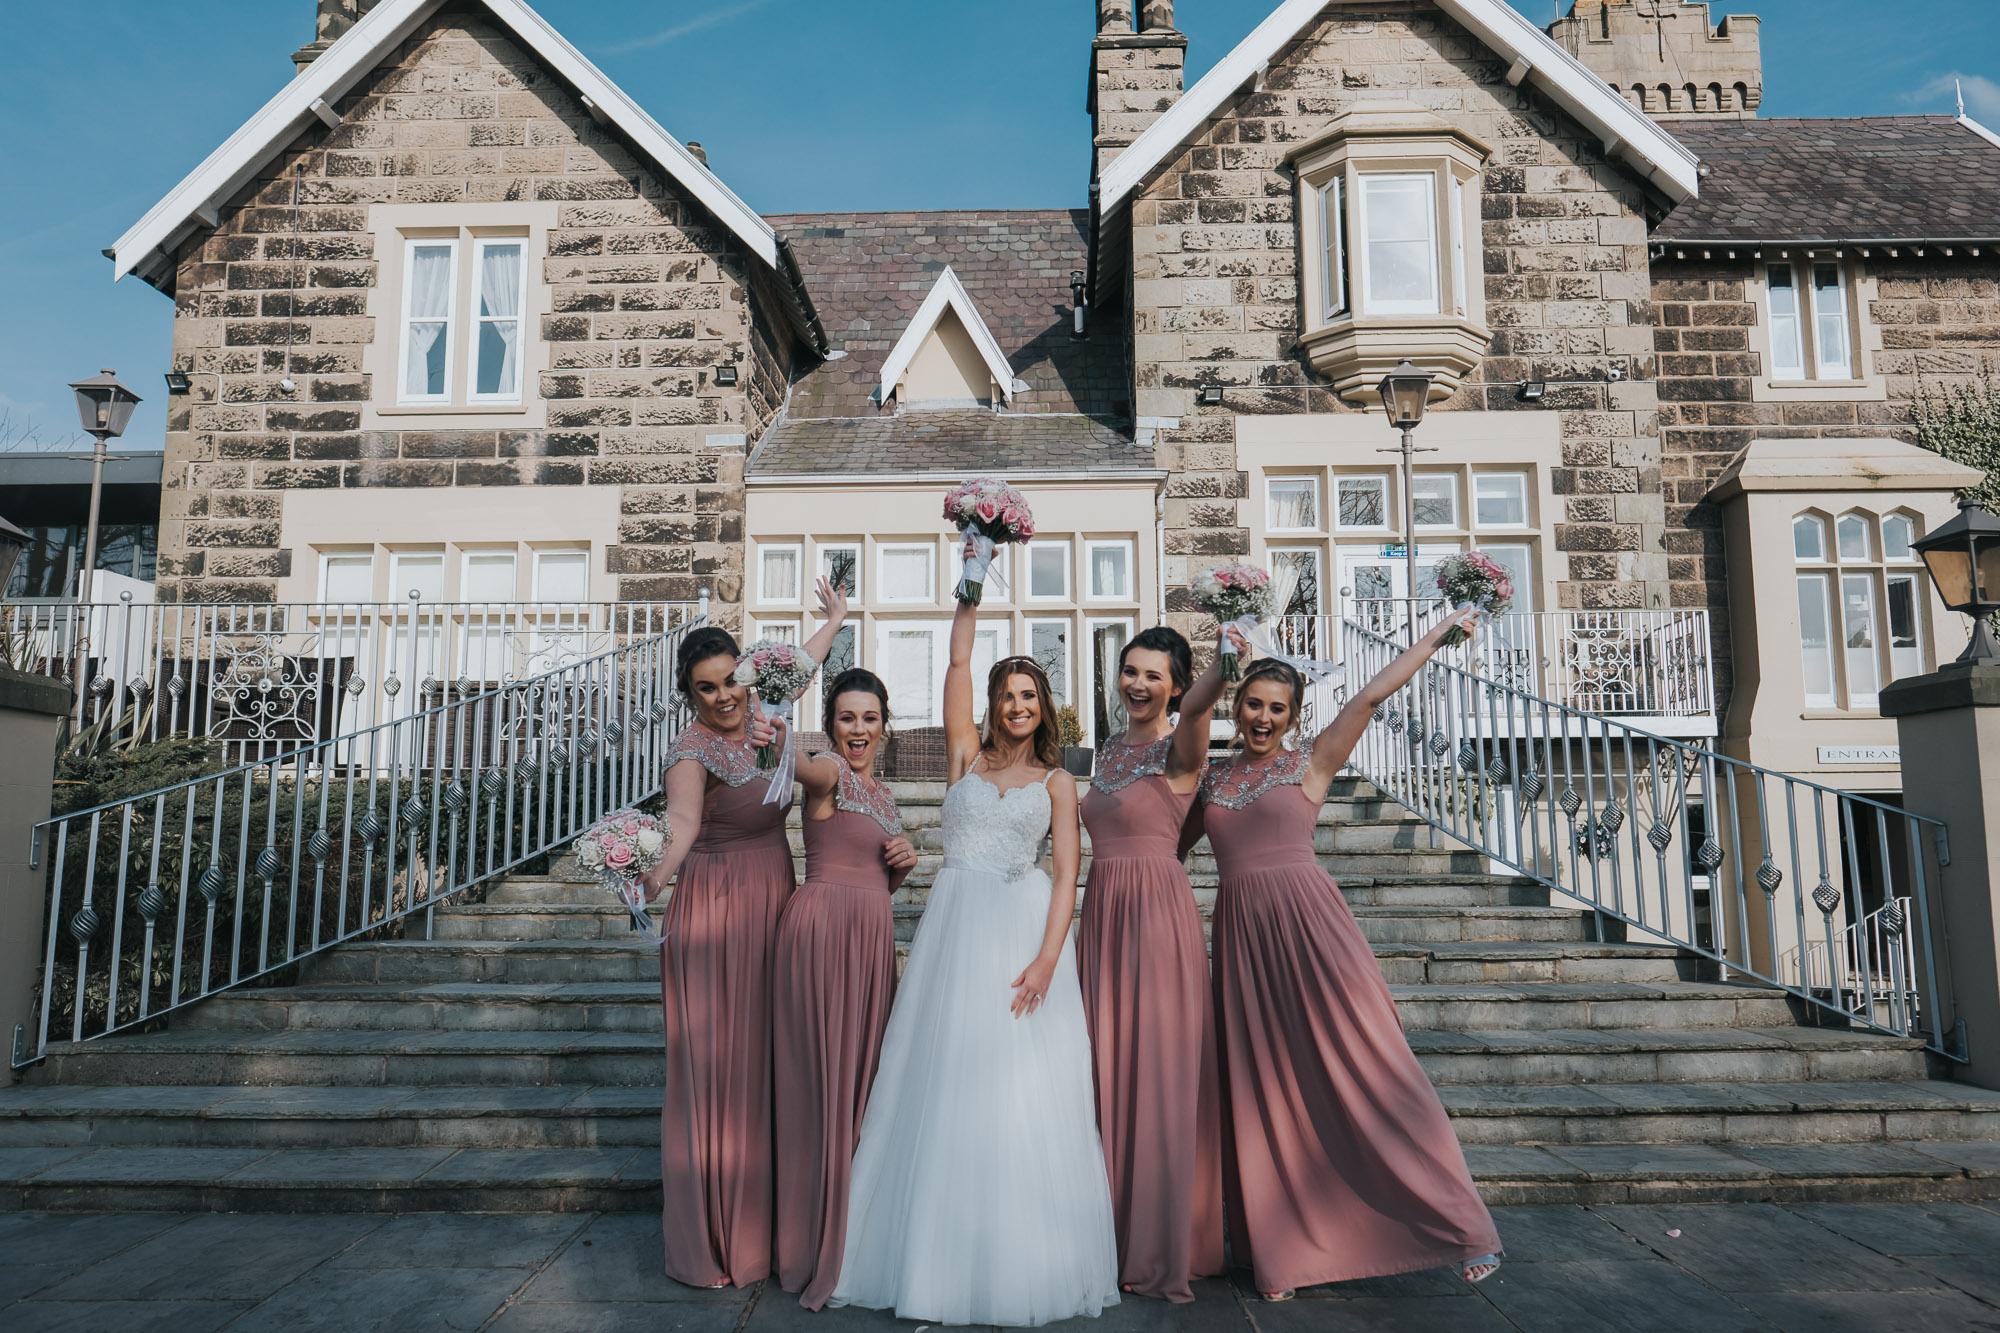 West Tower Exclusive Wedding Venue wedding photography merseyside and lancashire wedding photographer (30 of 60).jpg